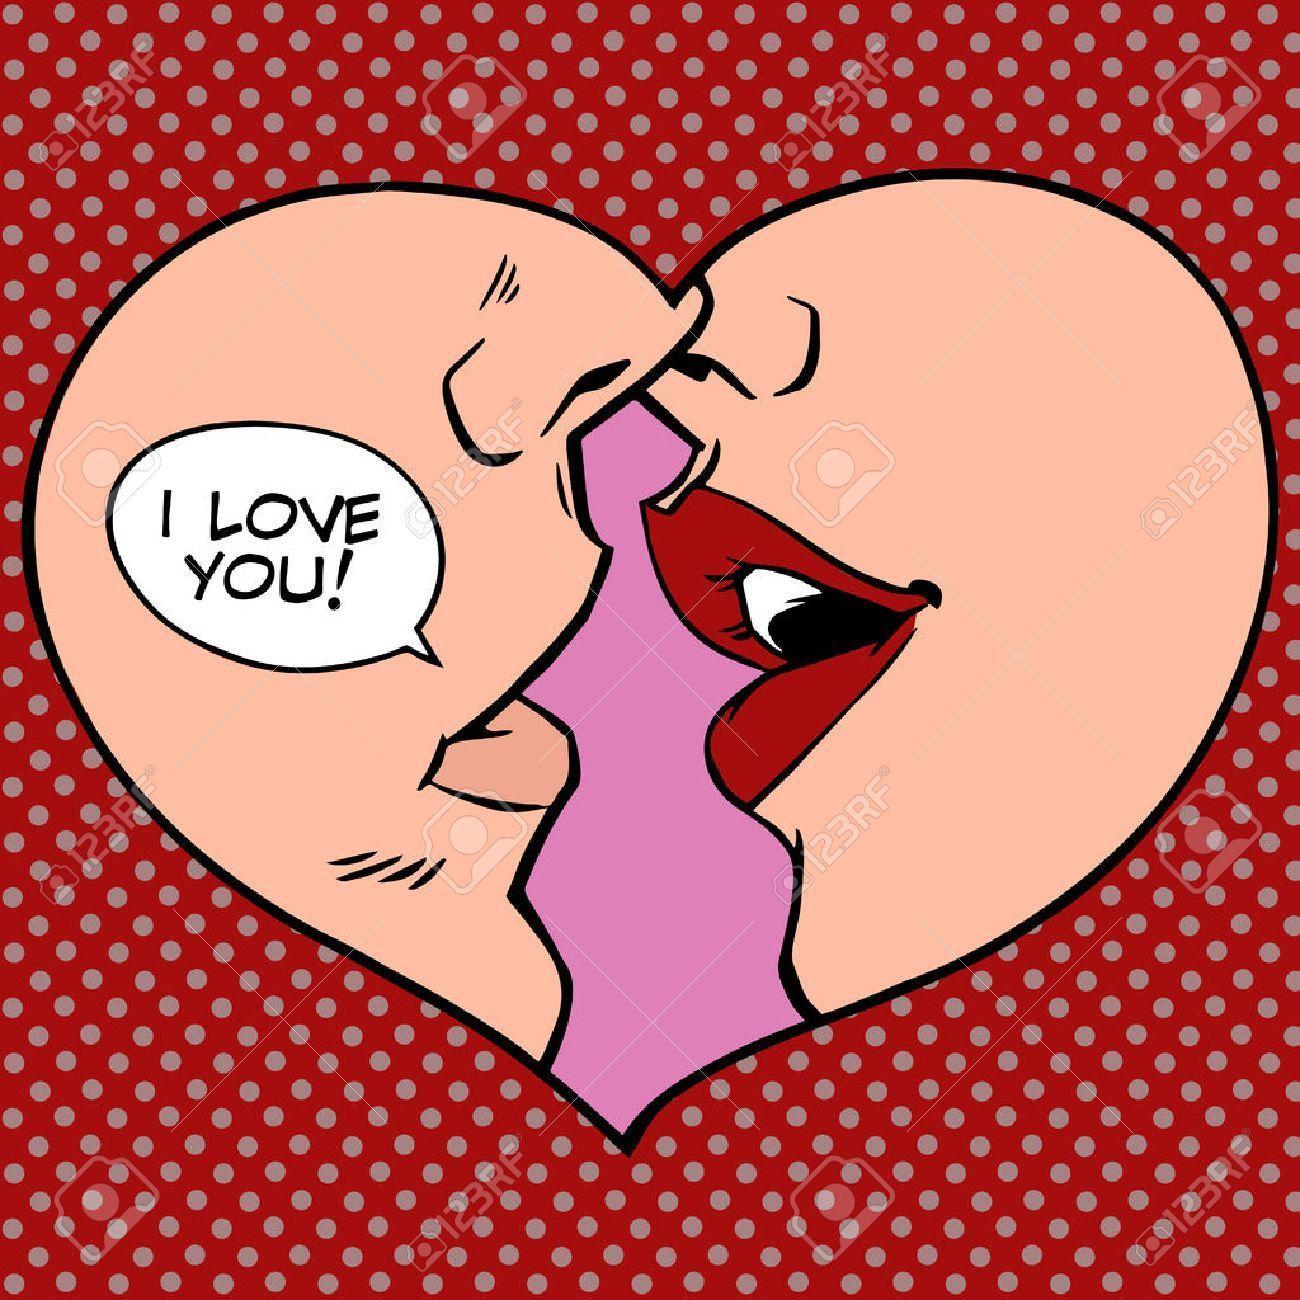 Stock Vector Retropop Heart Kiss I Love You Pop Art Retro Style Man And Woman Romantic Wedding Or Valentines Da Pop Art Drawing Pop Art Tattoos Pop Art Comic